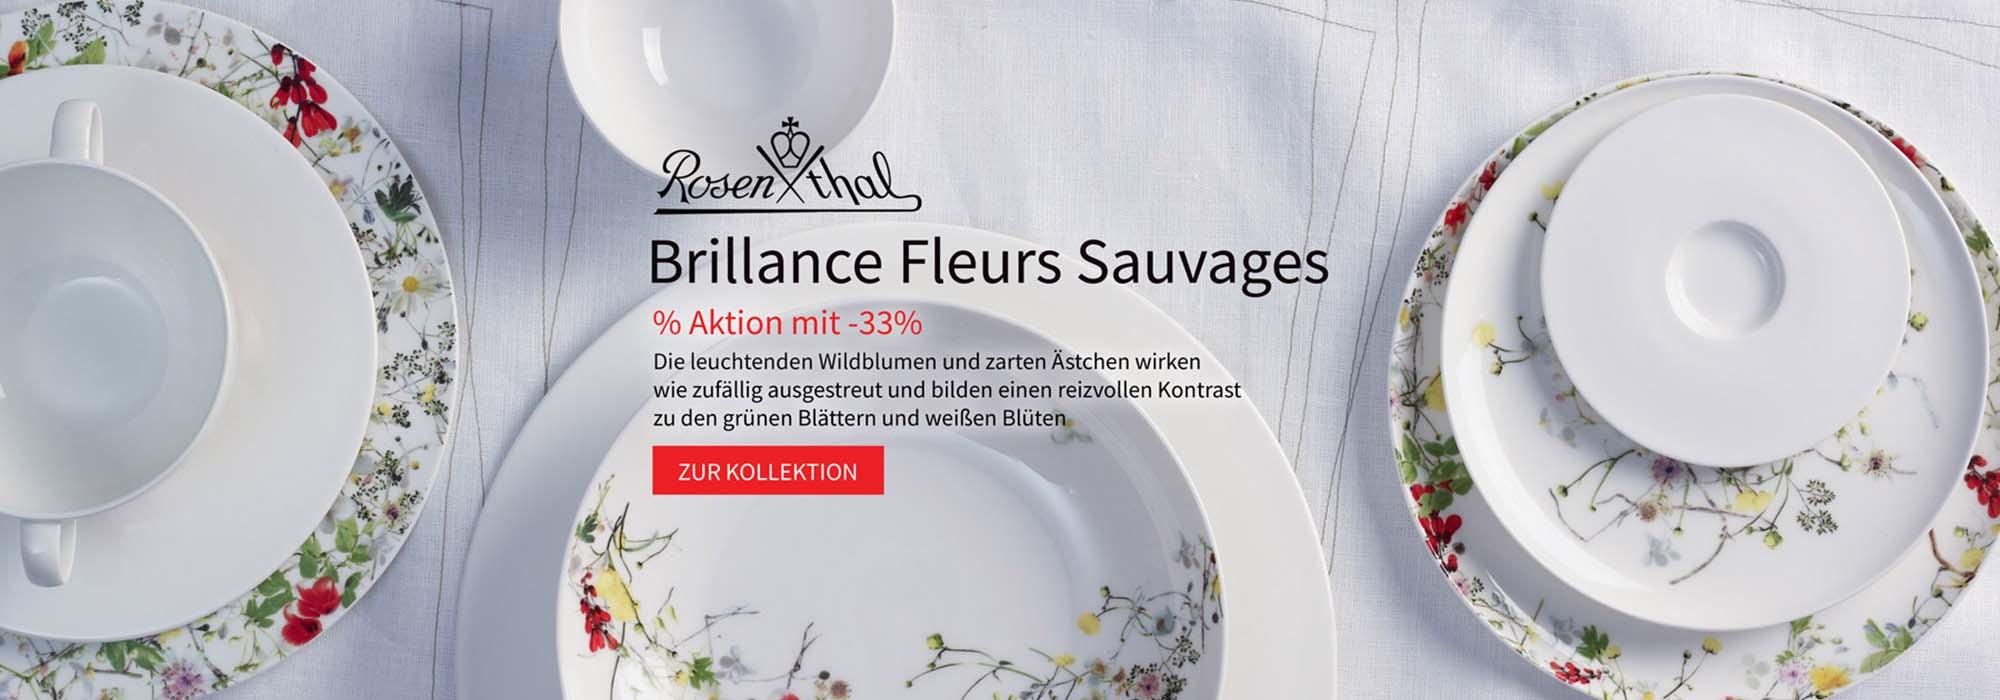 Rosenthal Selection Brillance Fleurs Sauvages